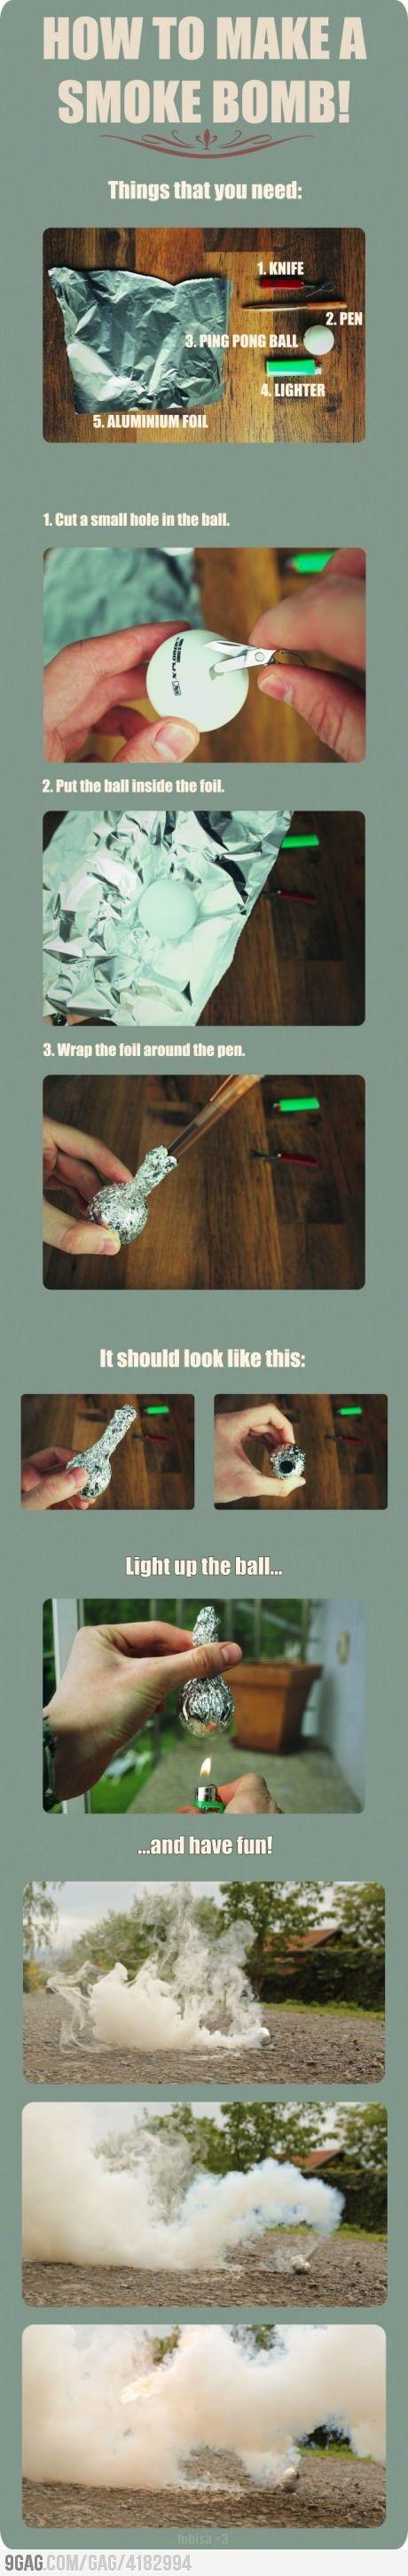 Handmade Smoke Bomb